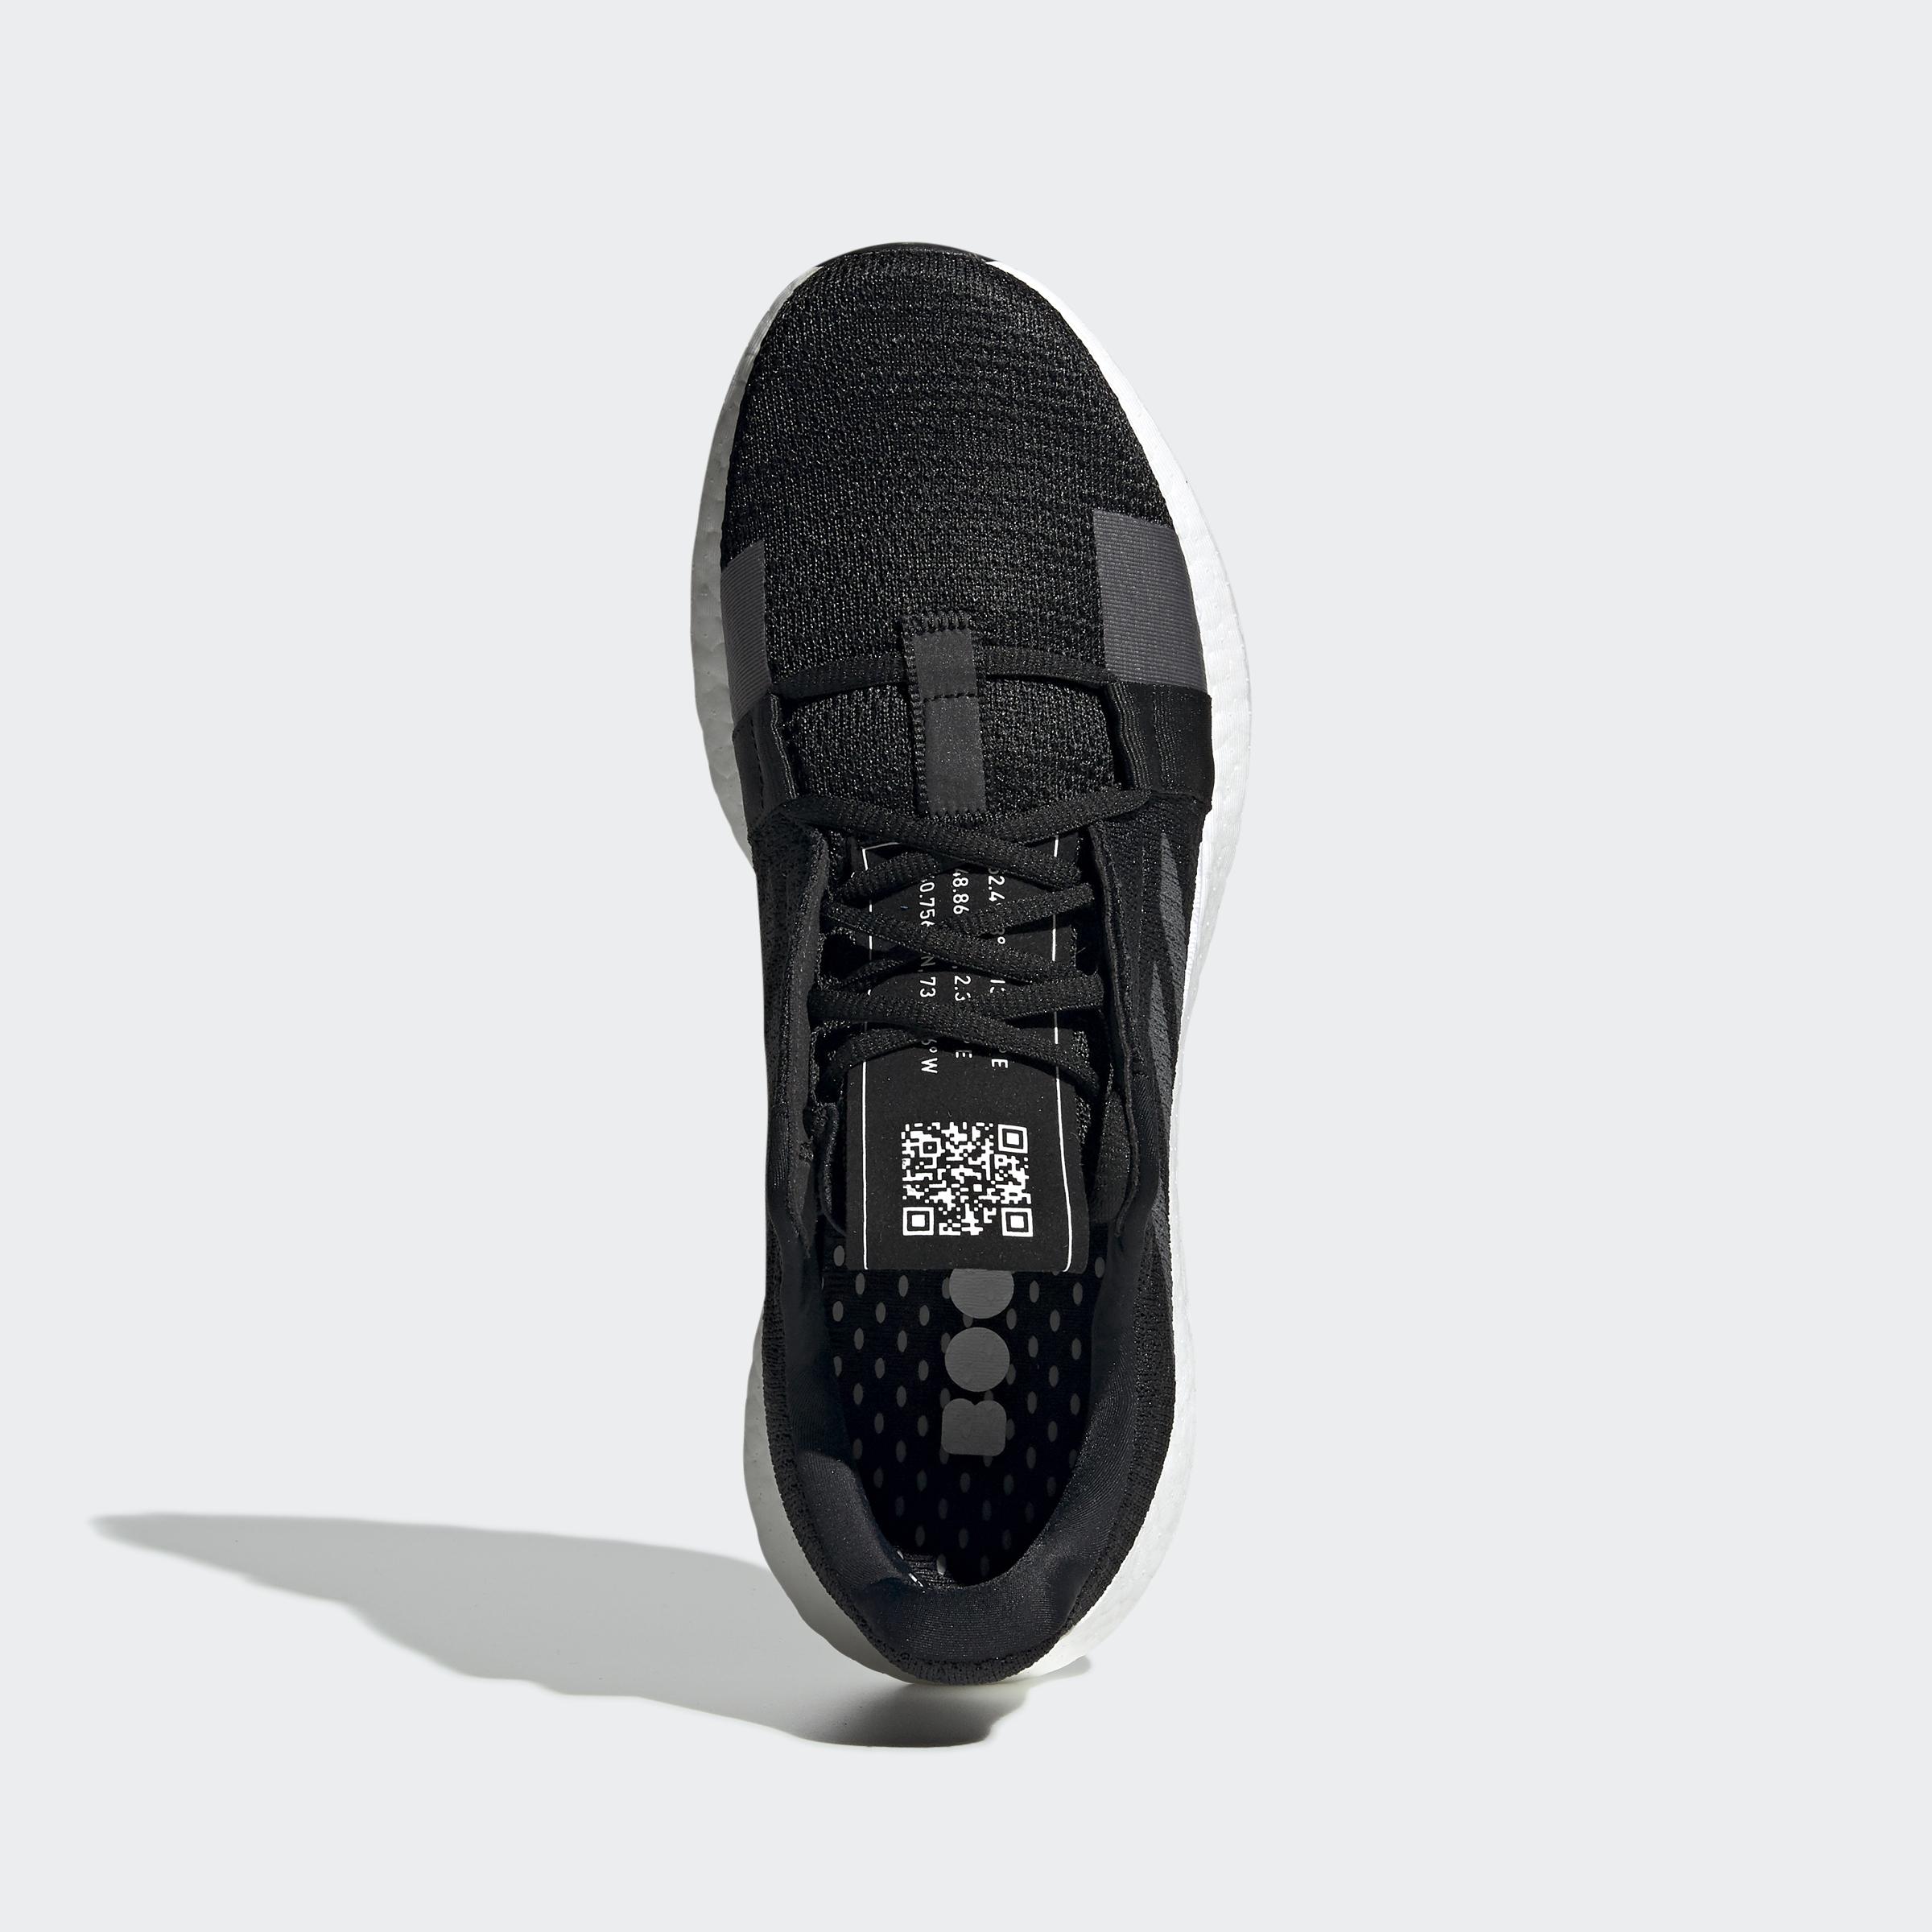 miniature 22 - adidas Senseboost Go Shoes Men's Athletic & Sneakers